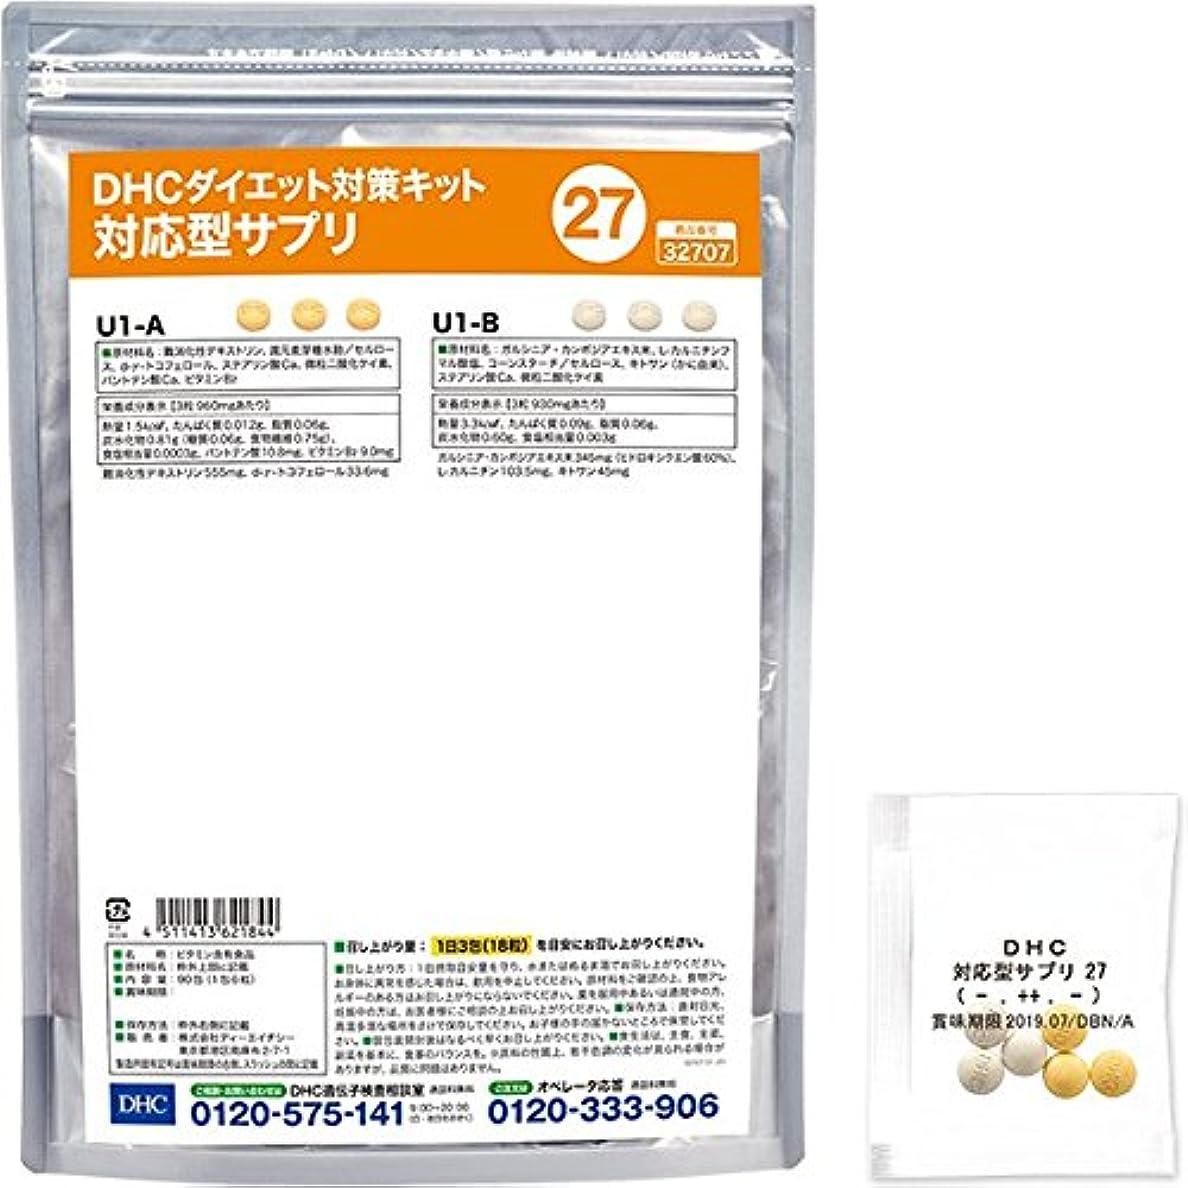 DHCダイエット対策キット対応型サプリ27